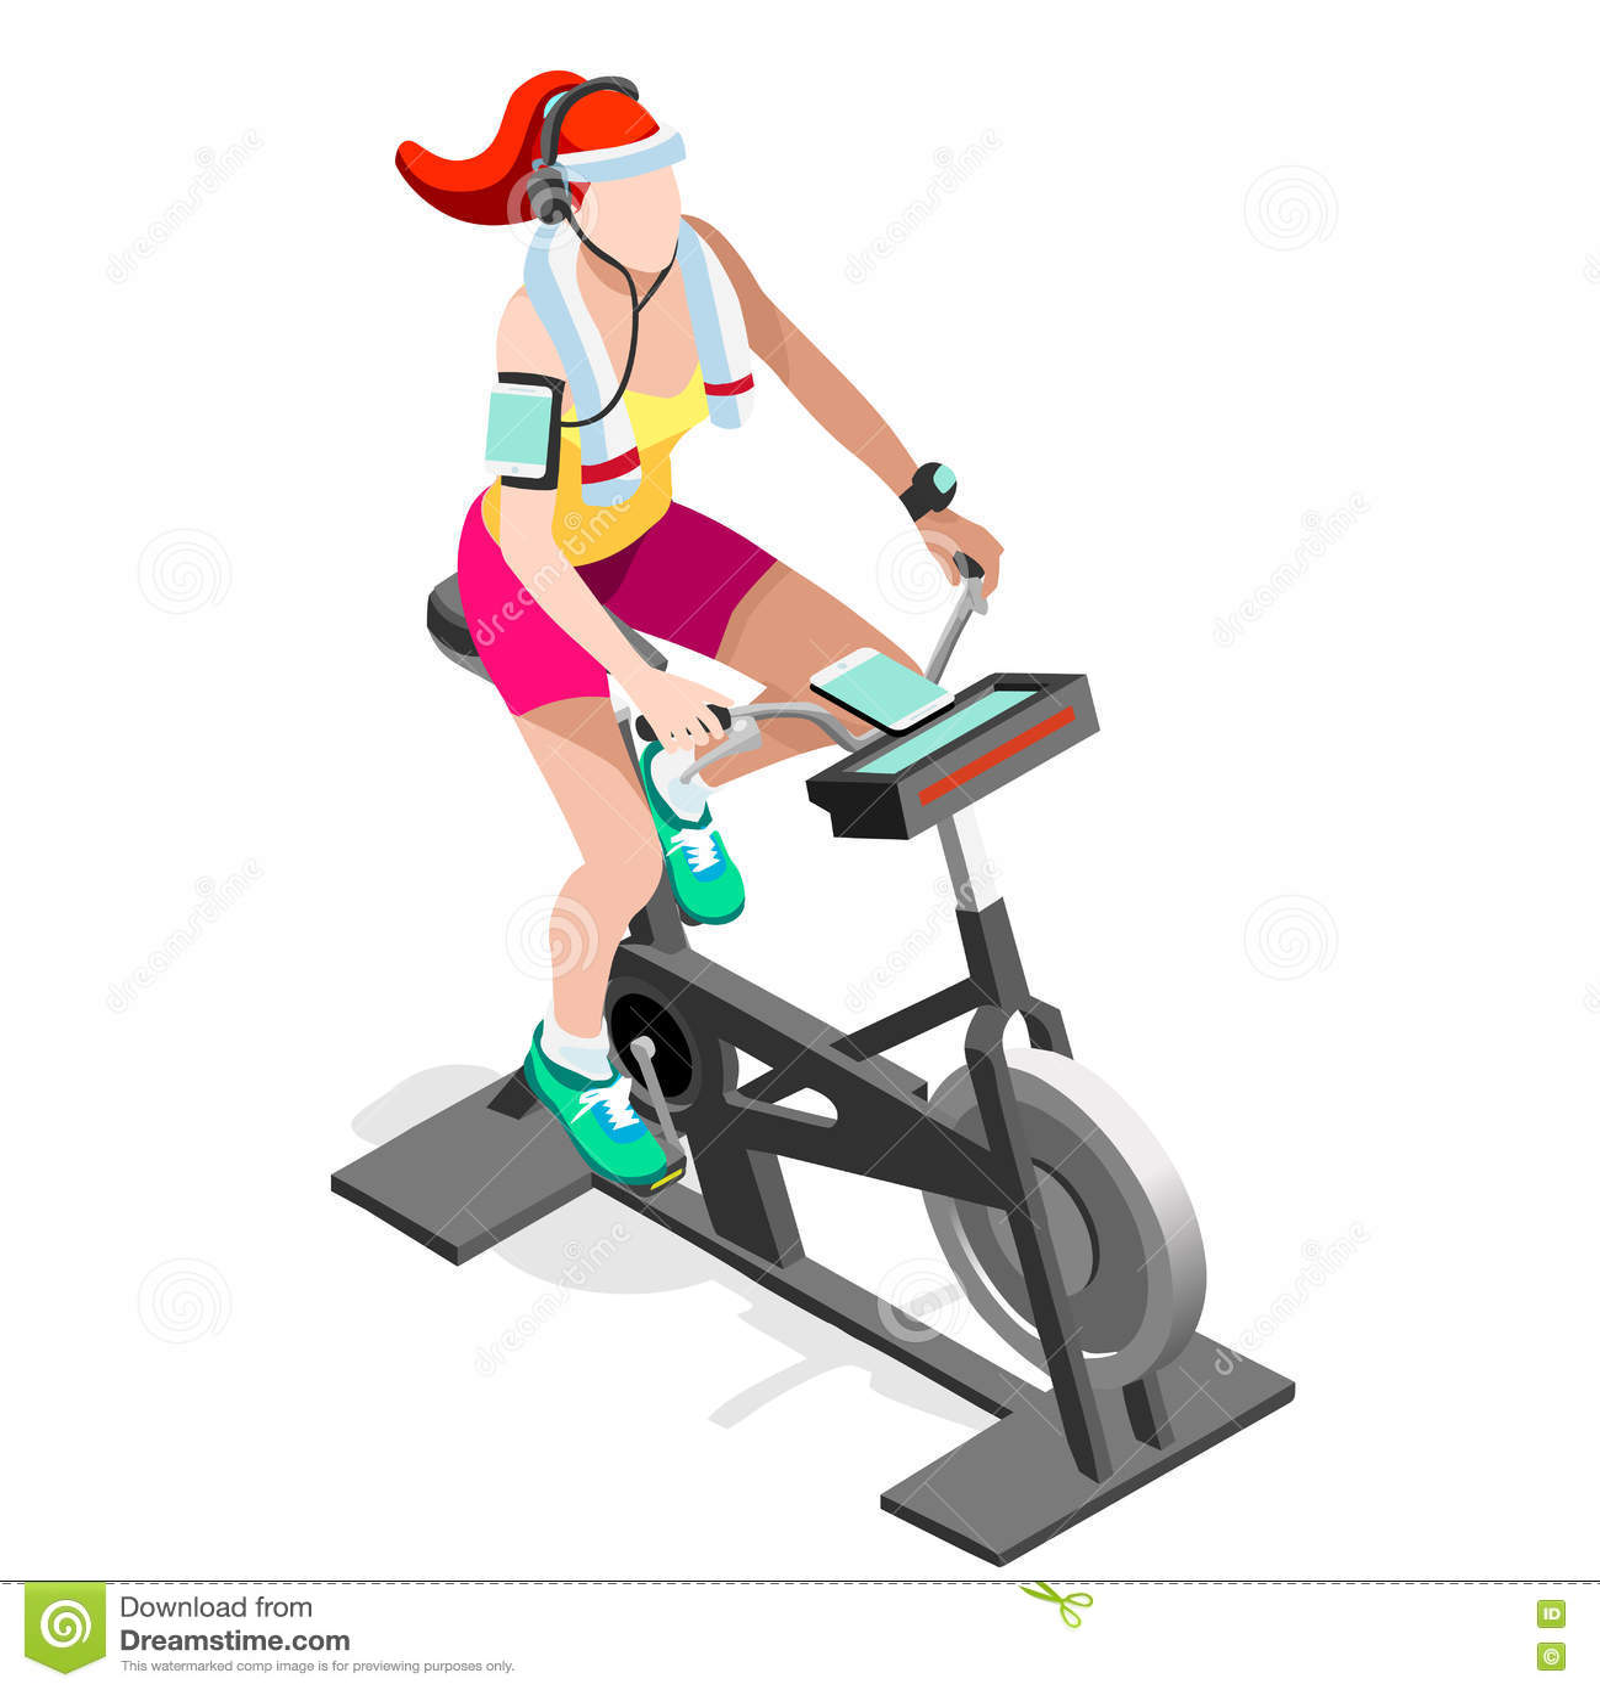 Isometric Exercise Equipment 1962: Exercise Bike Spinning Fitness Class.3D Flat Isometric